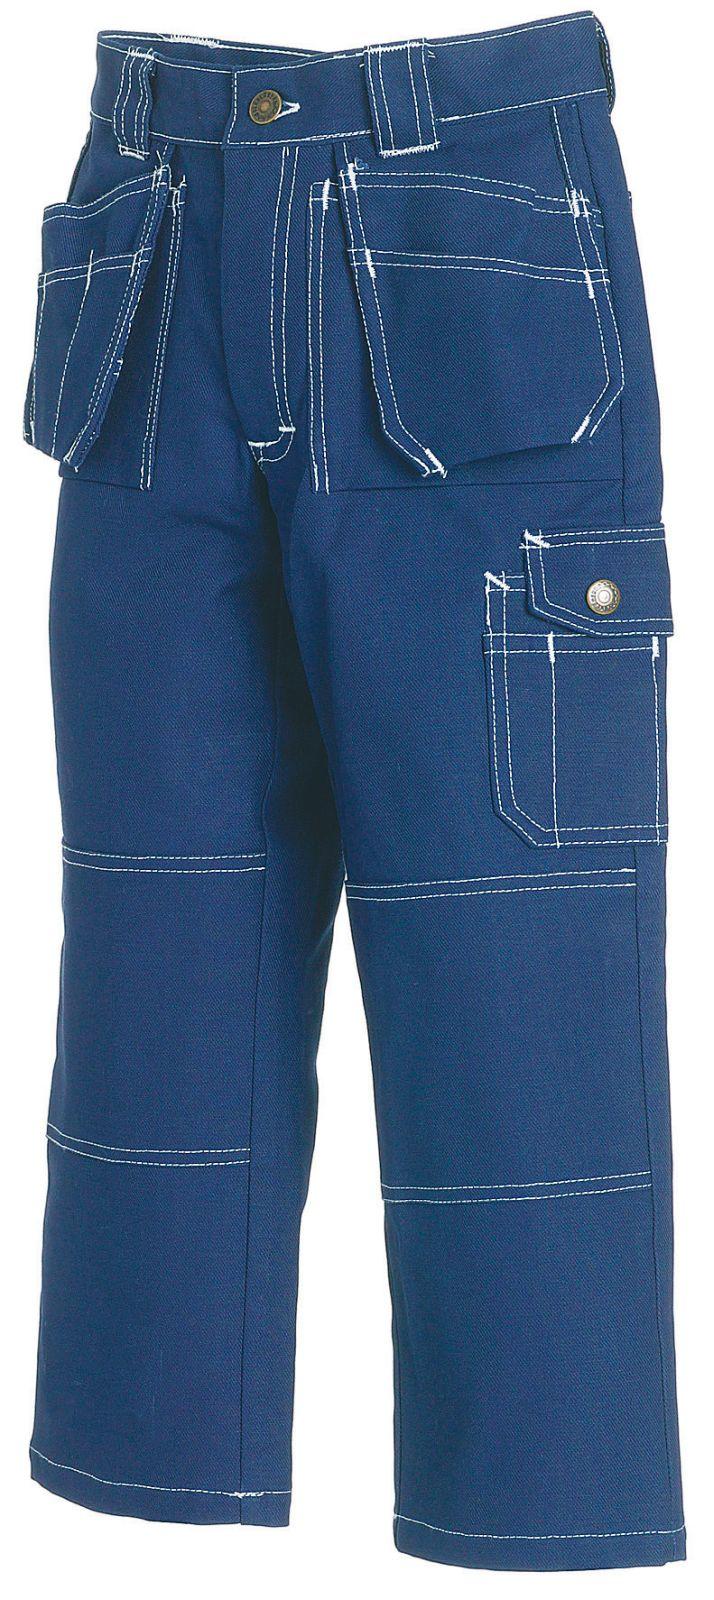 Blaklader Kinderkleding 15441370 marineblauw(8800)